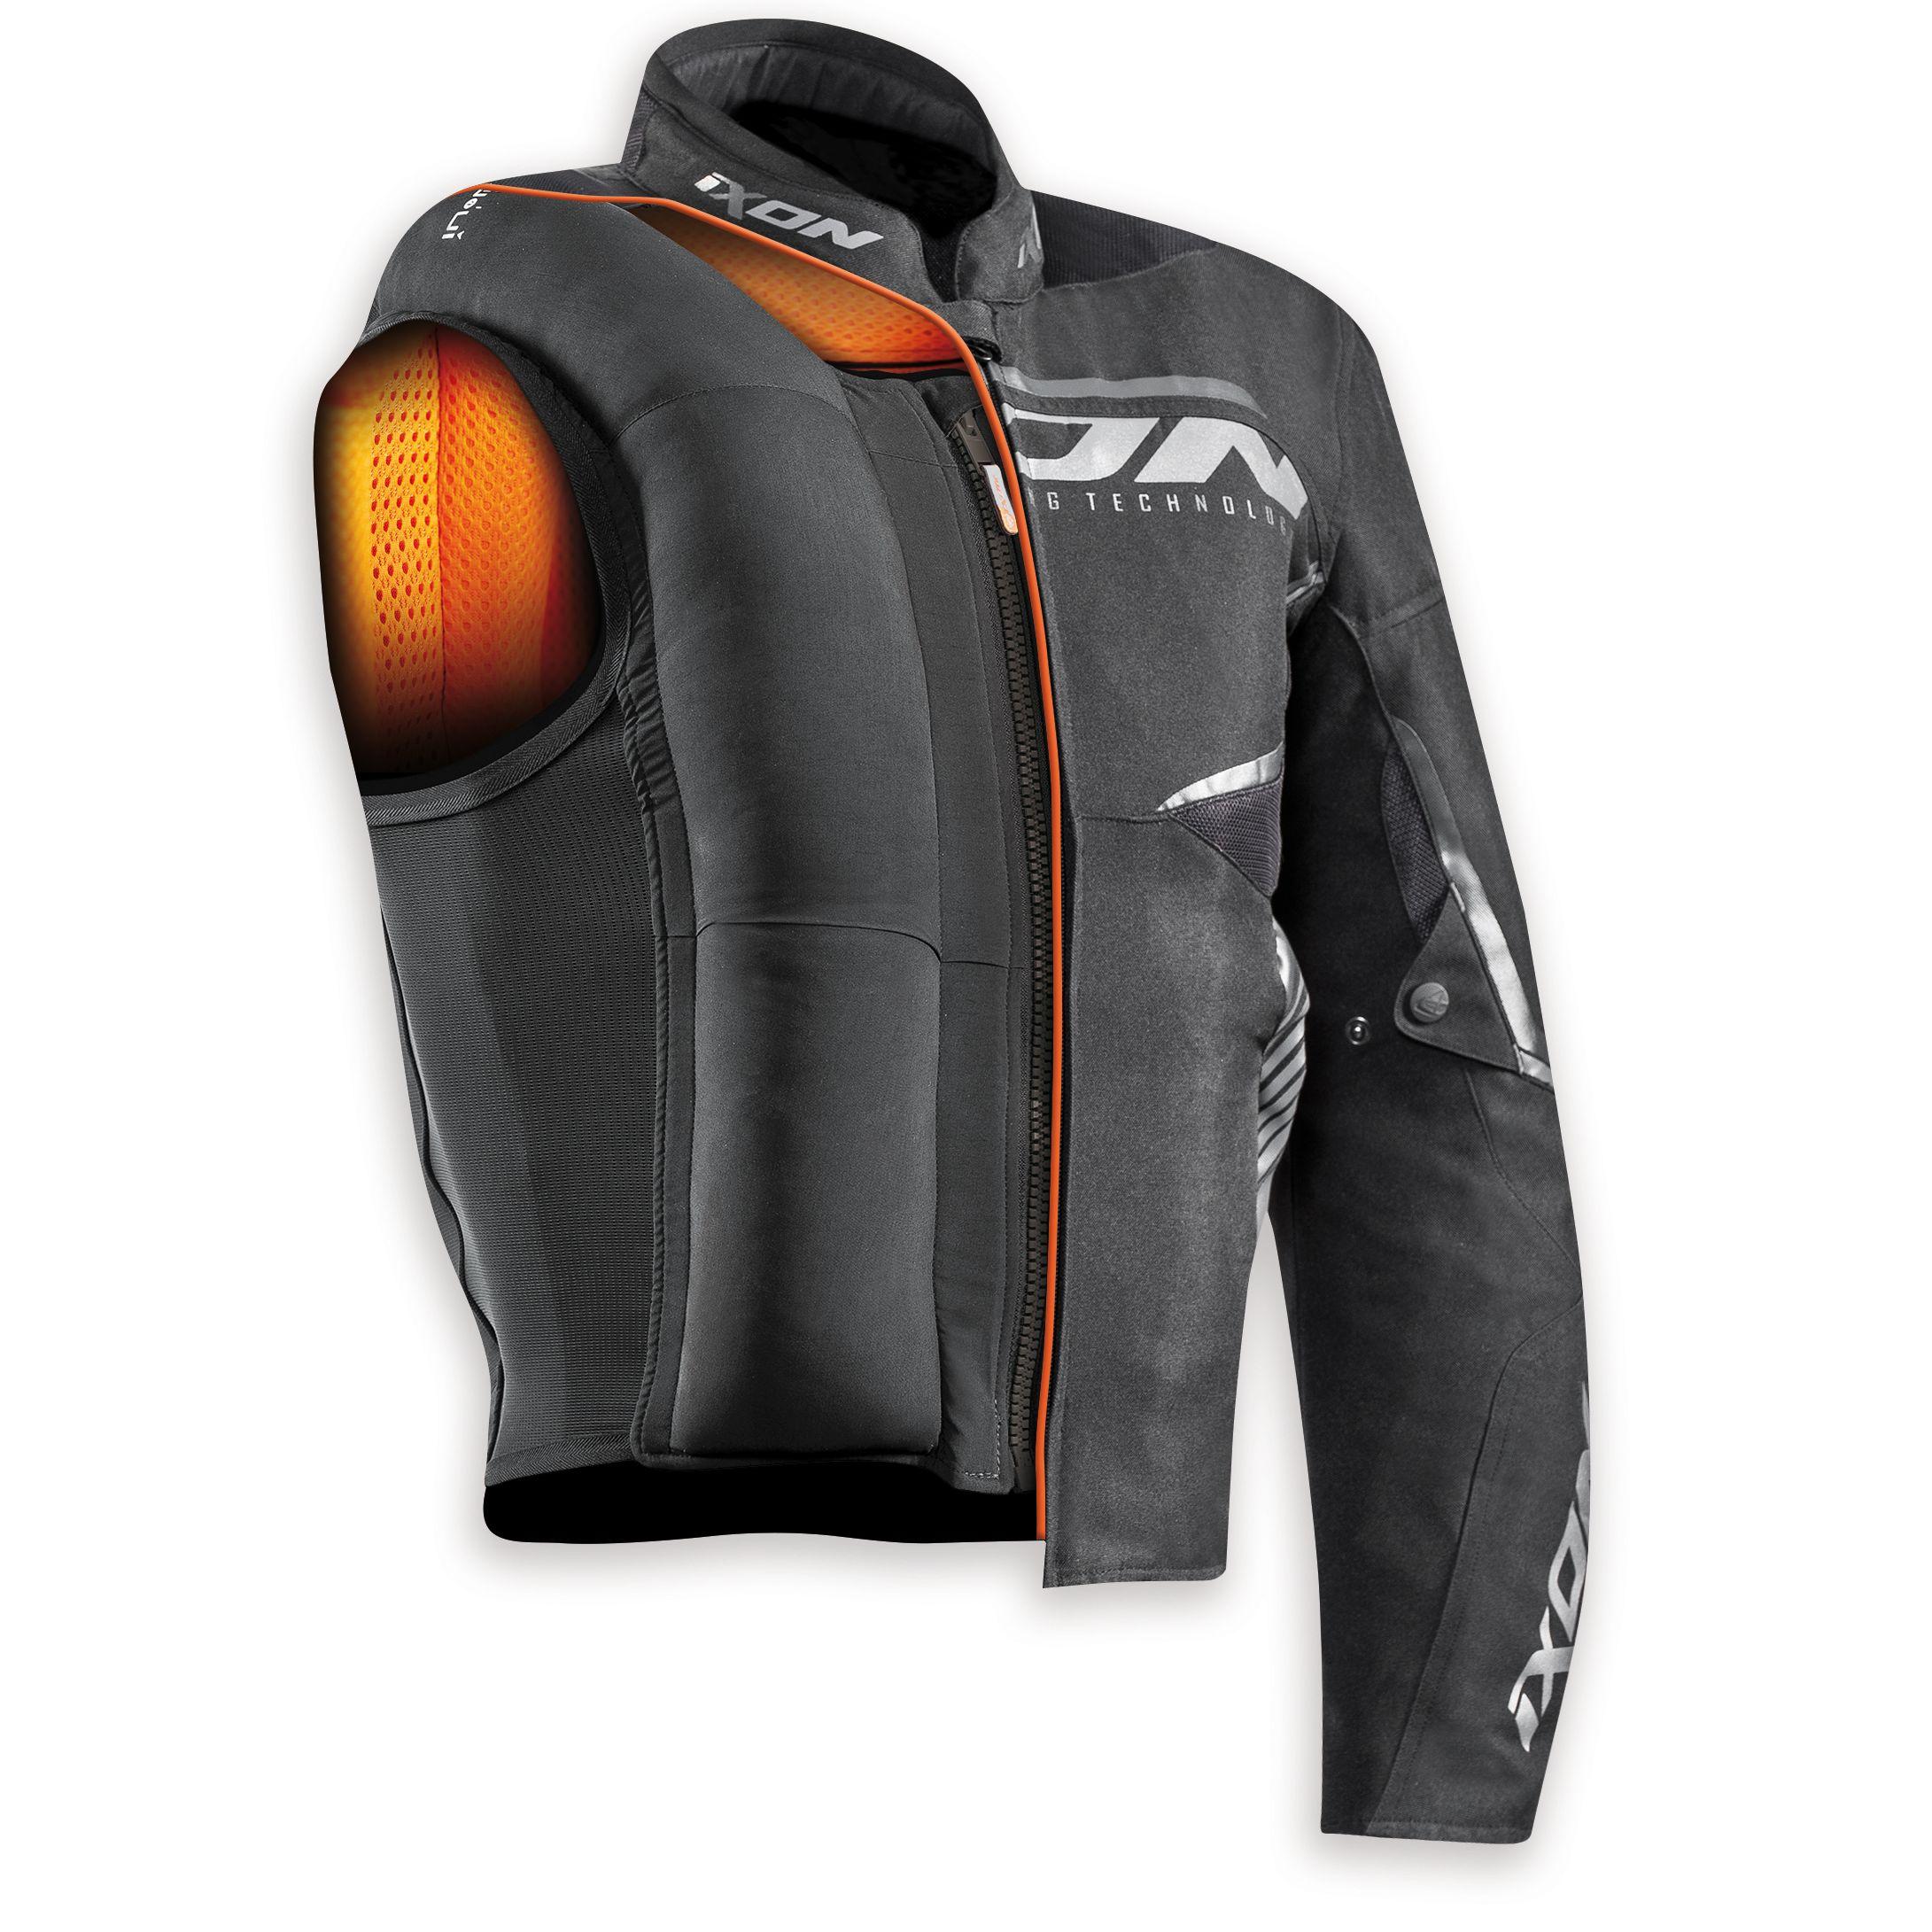 7e5e75f60ad Gilet Airbag Ixon IX-AIRBAG UO3 - Cazadoras y chaquetas moto ...